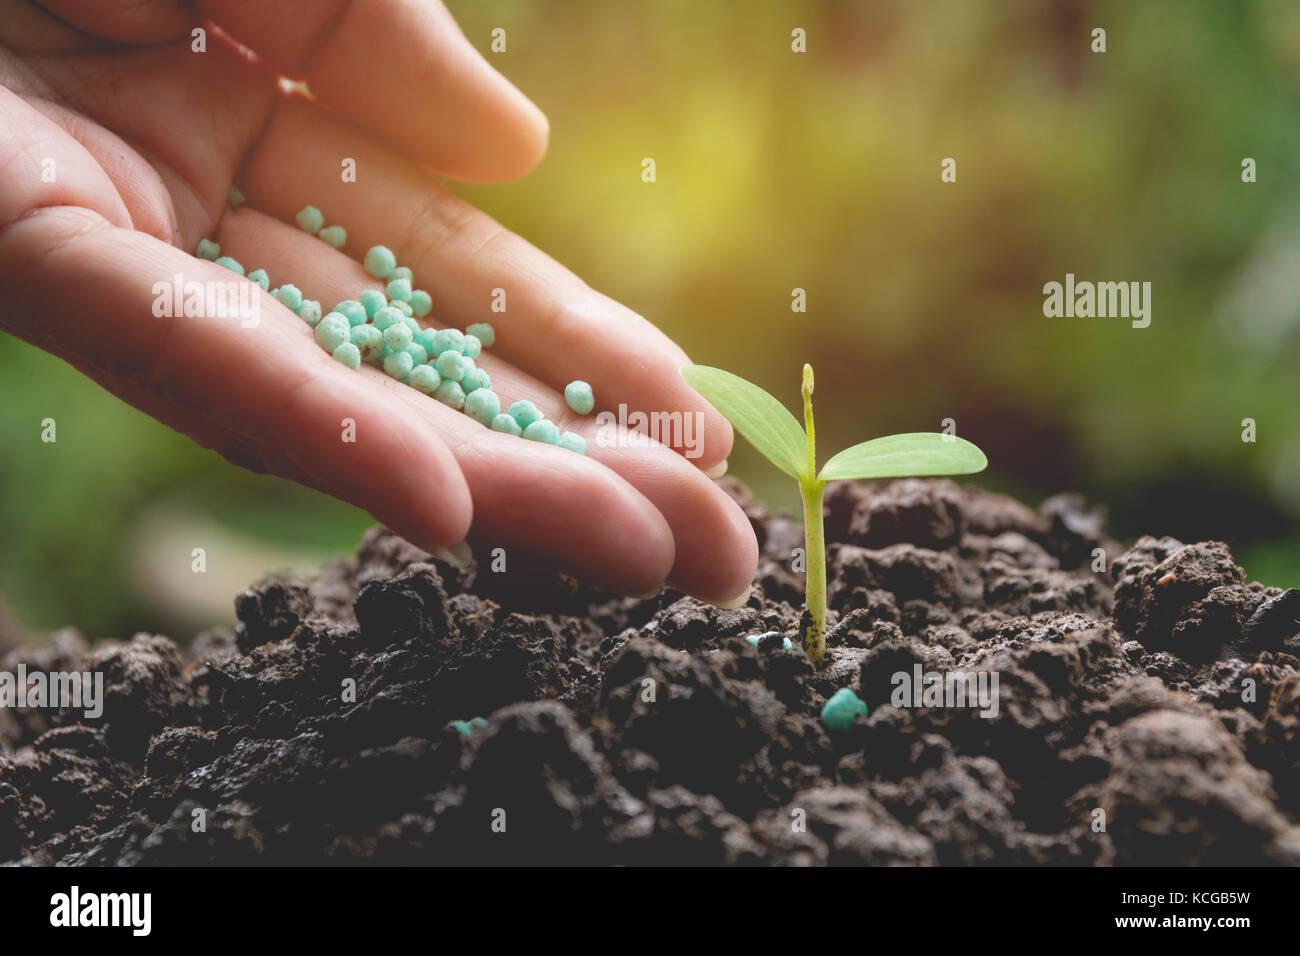 Apply Fertilizer Stock Photos & Apply Fertilizer Stock Images - Alamy